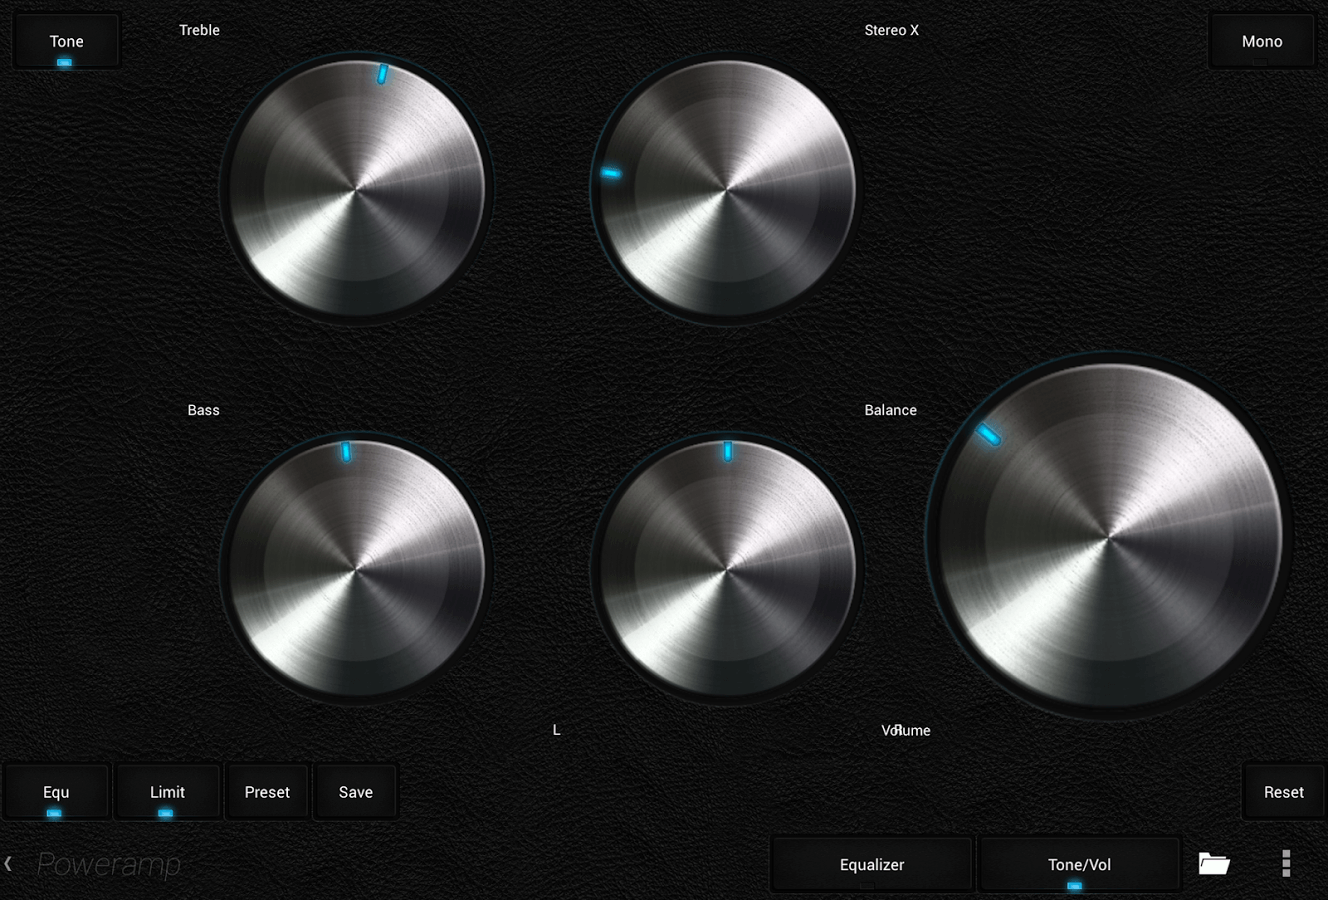 Музыкальный плеер для Android - Poweramp